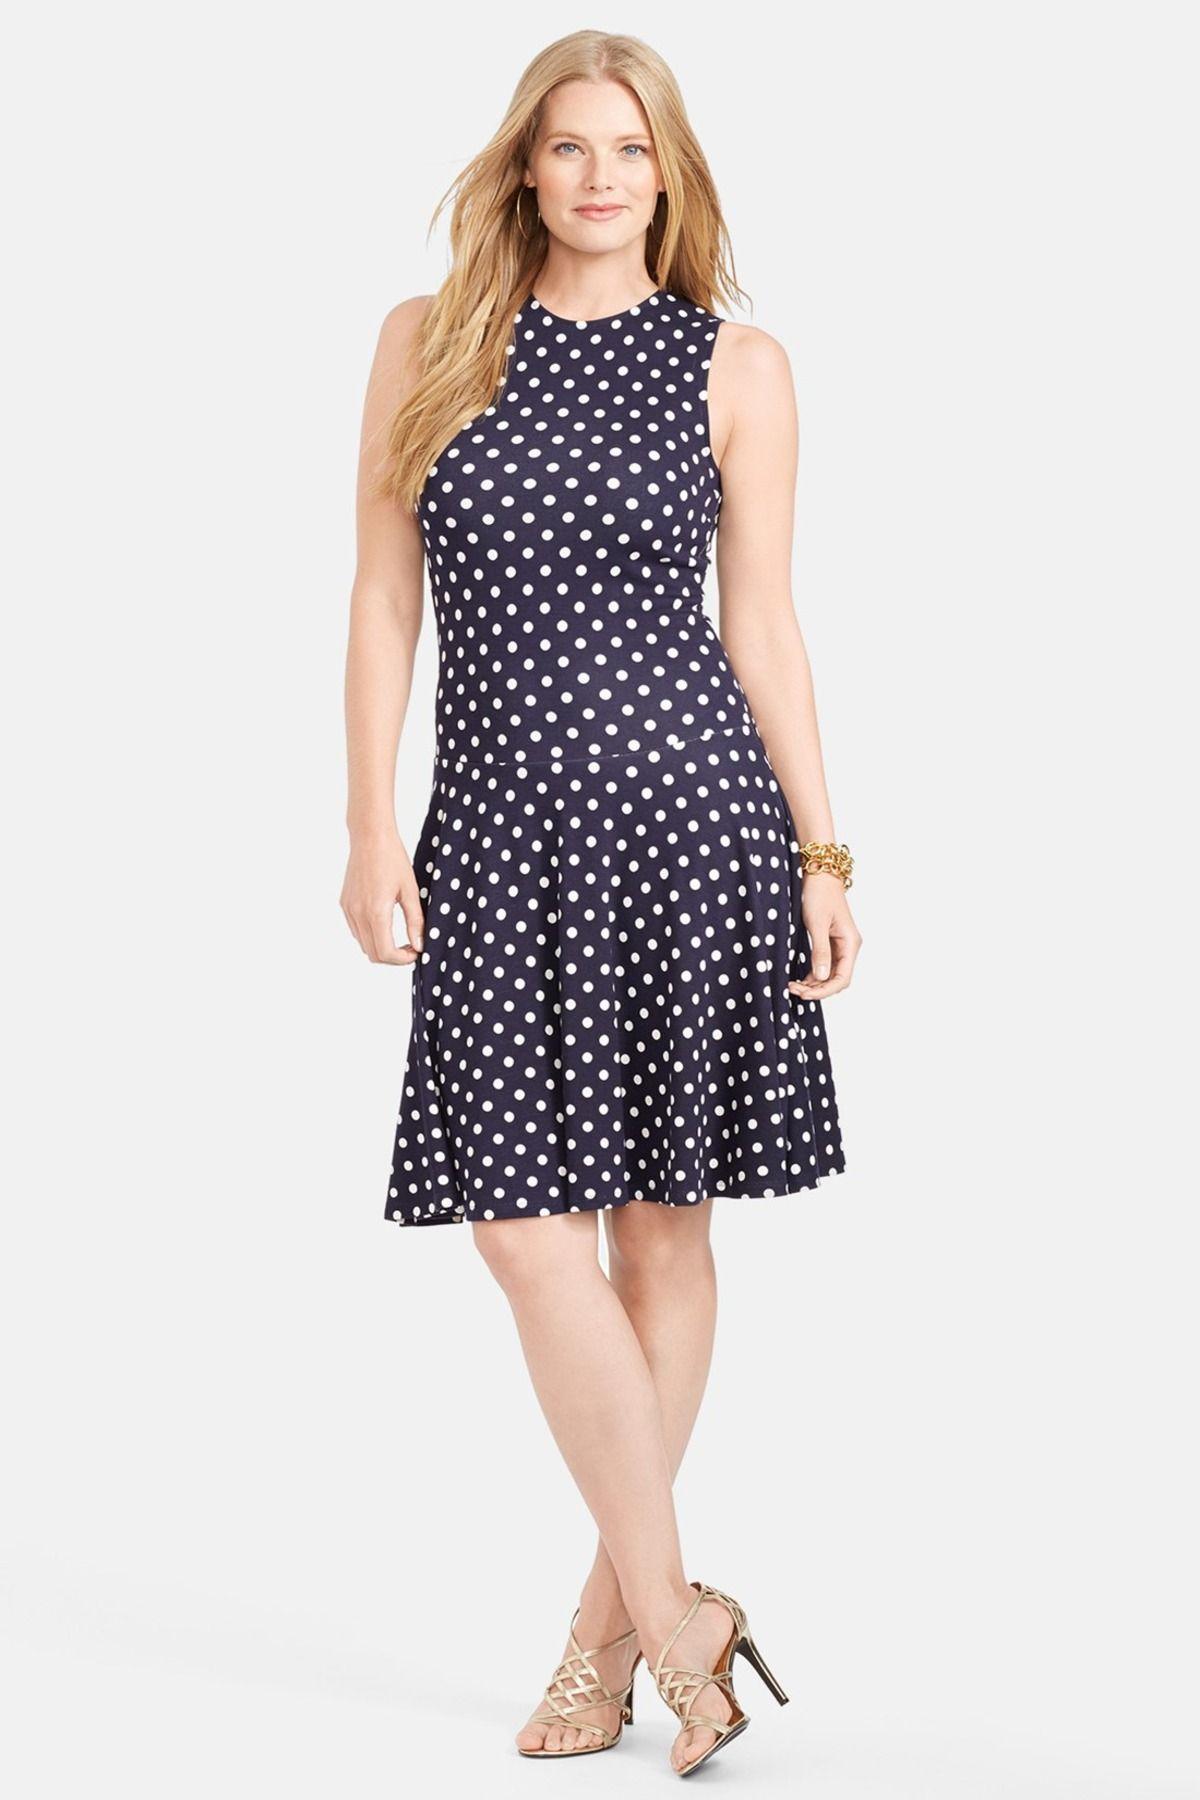 Lauren Ralph Lauren Polka Dot Drop Waist Dress Plus Size Drop